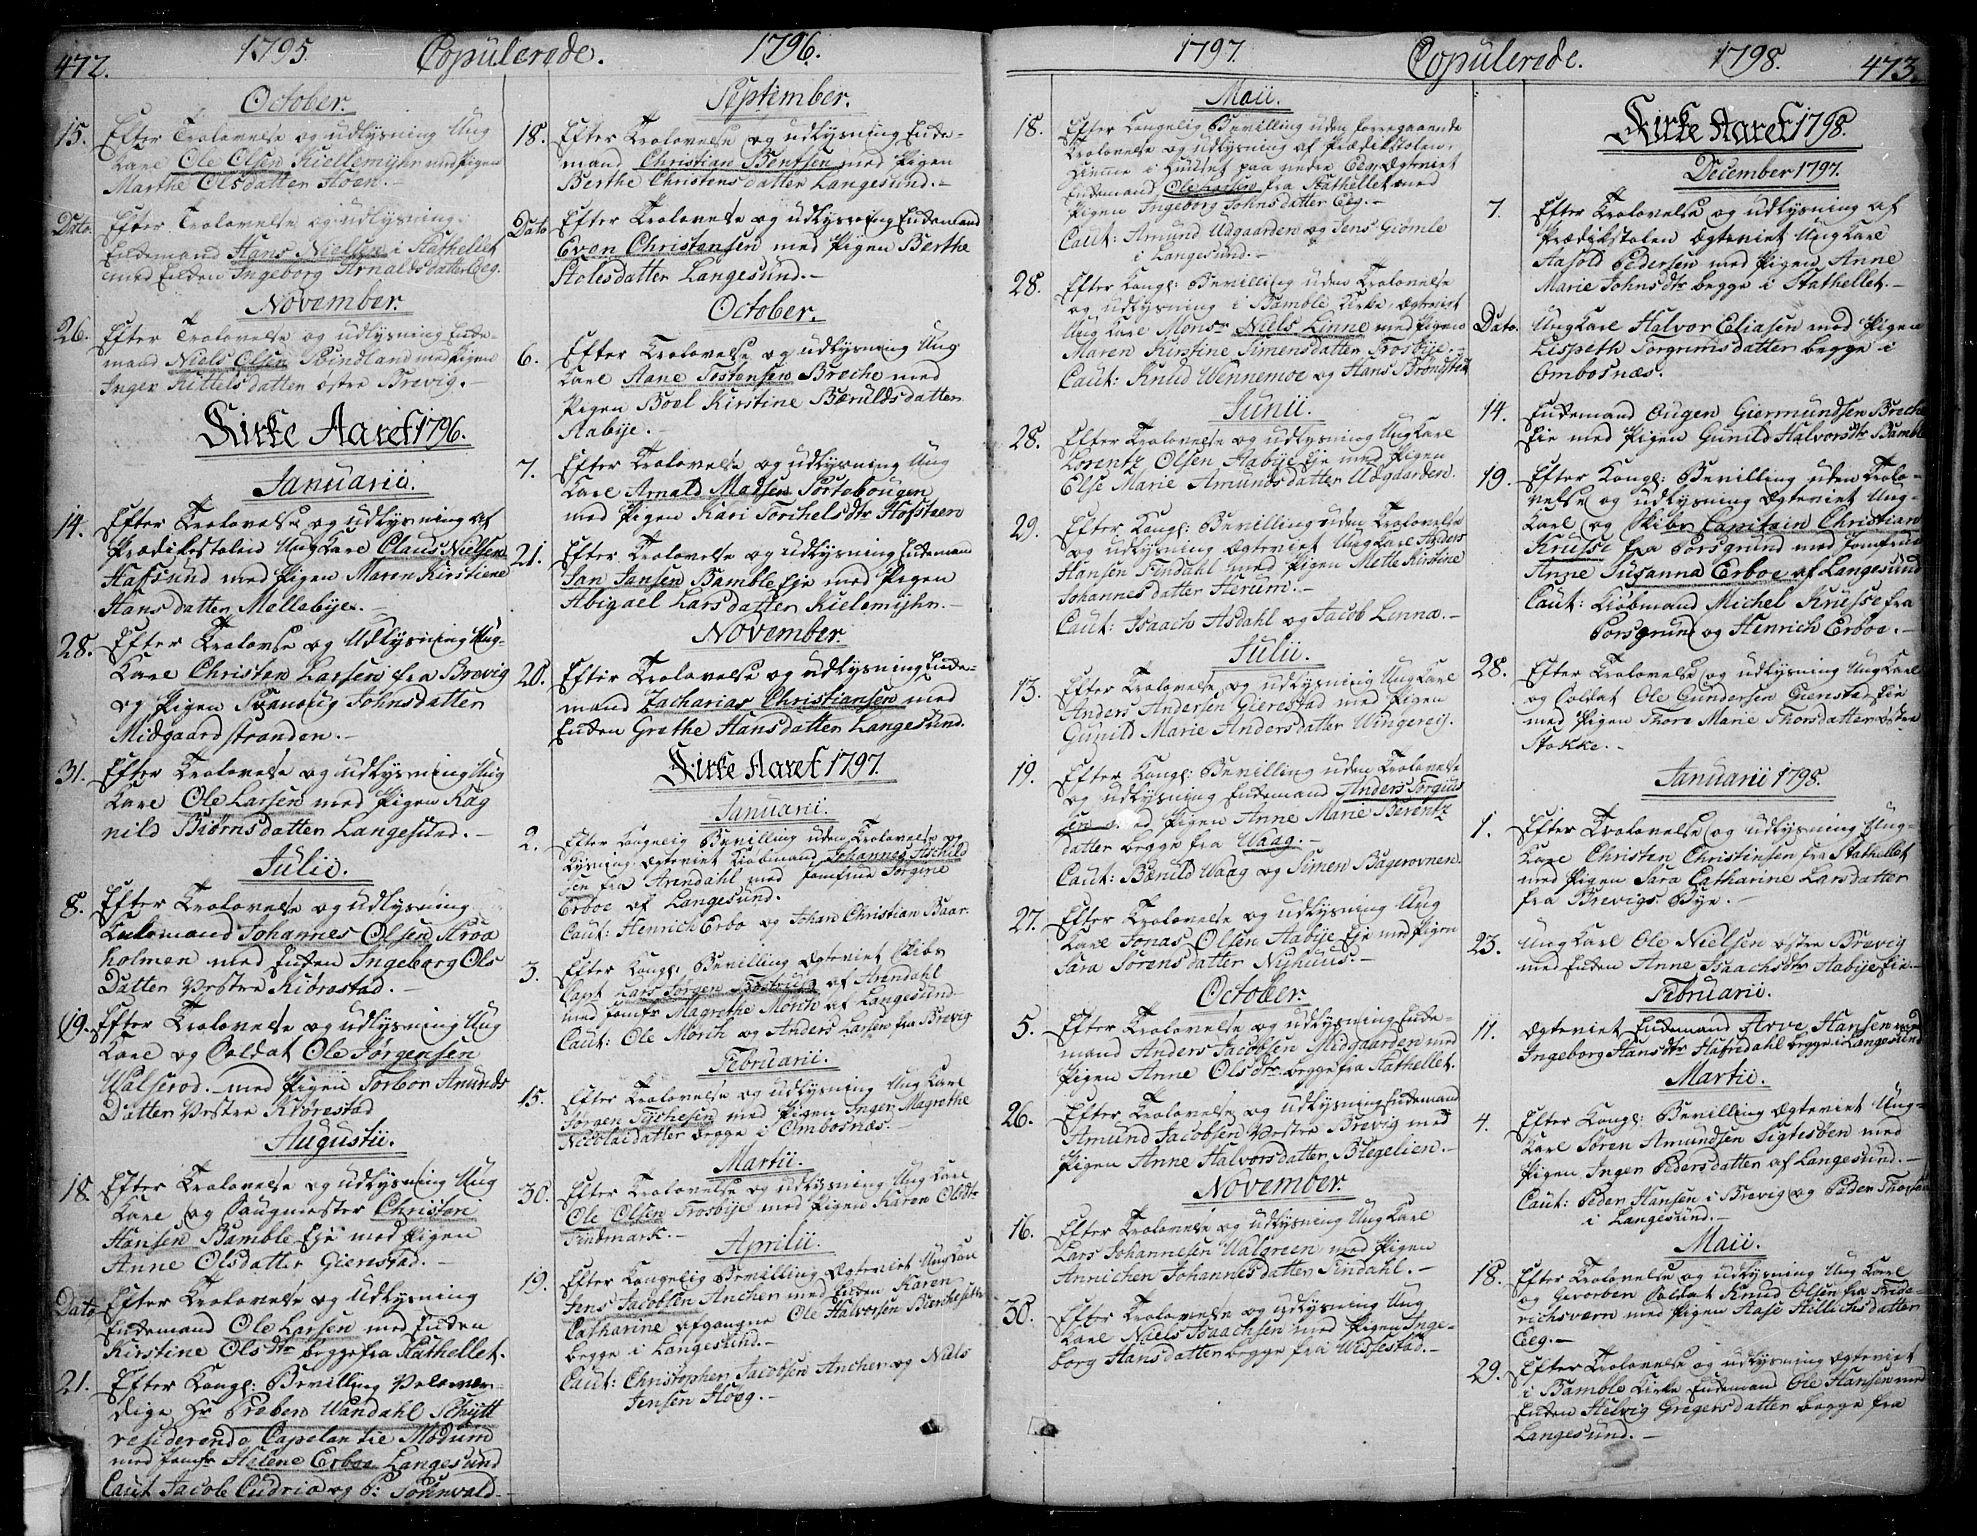 SAKO, Bamble kirkebøker, F/Fa/L0002: Ministerialbok nr. I 2, 1775-1814, s. 472-473